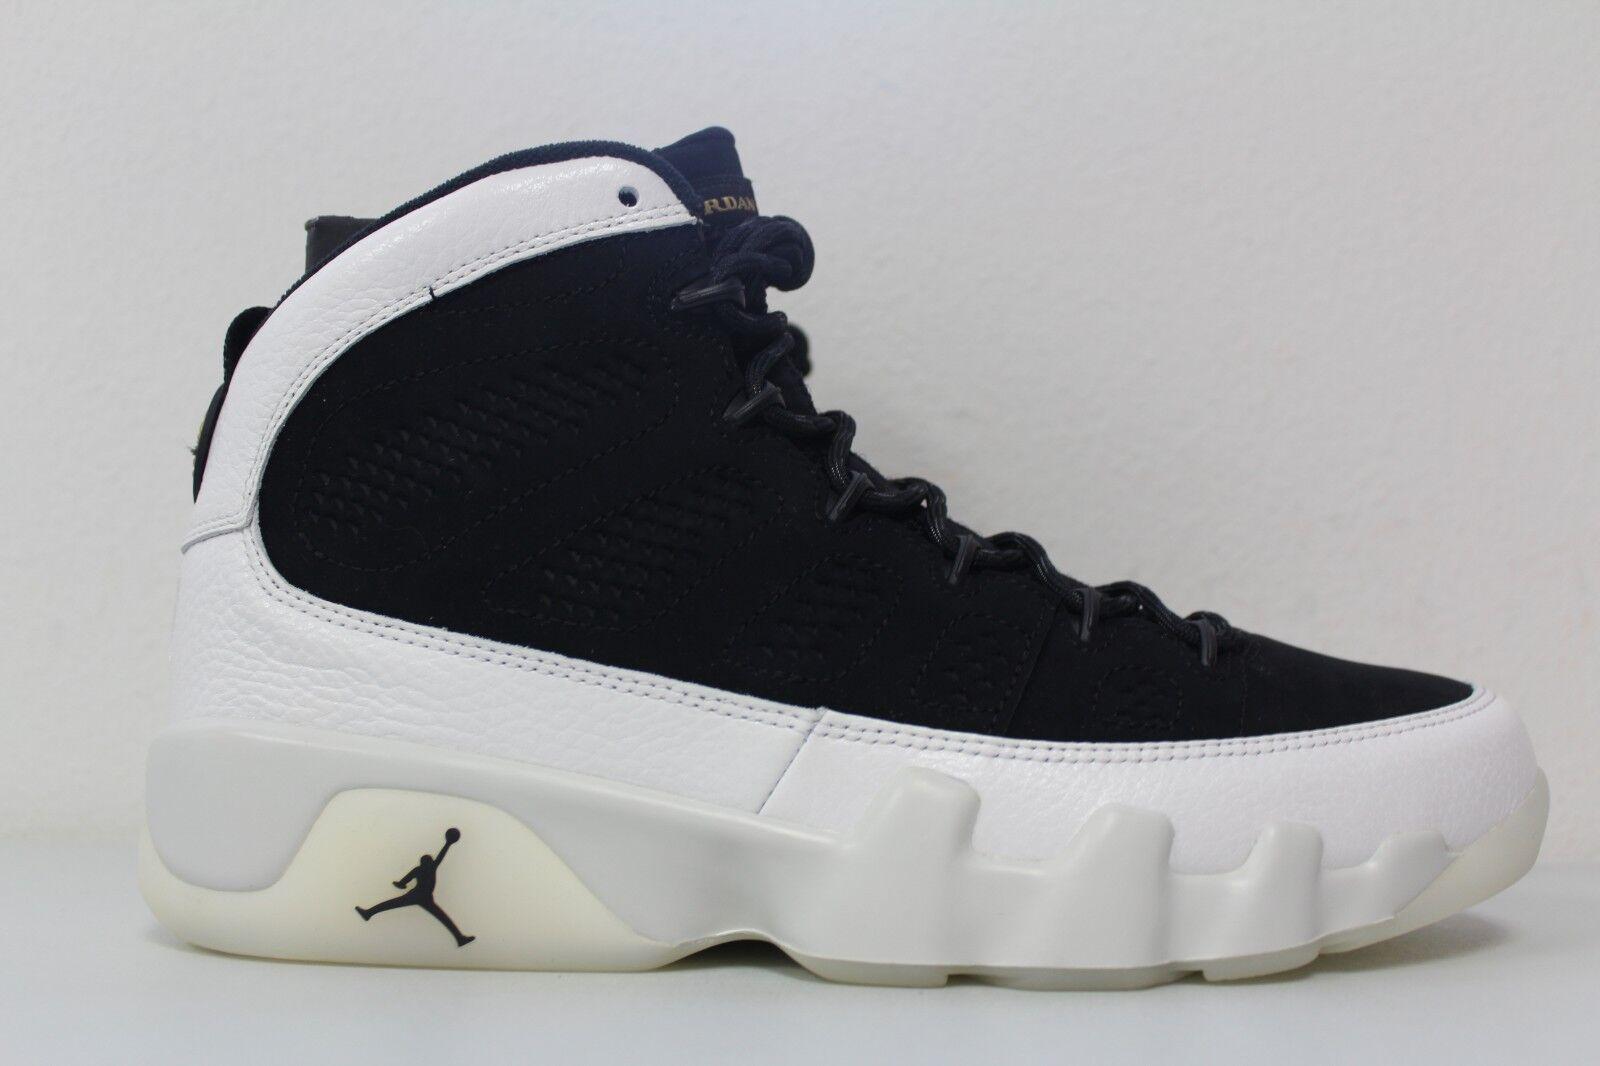 Nike Air Jordan 9 Retro All Star City Of Flight LA Black White 302370-021 Size 8